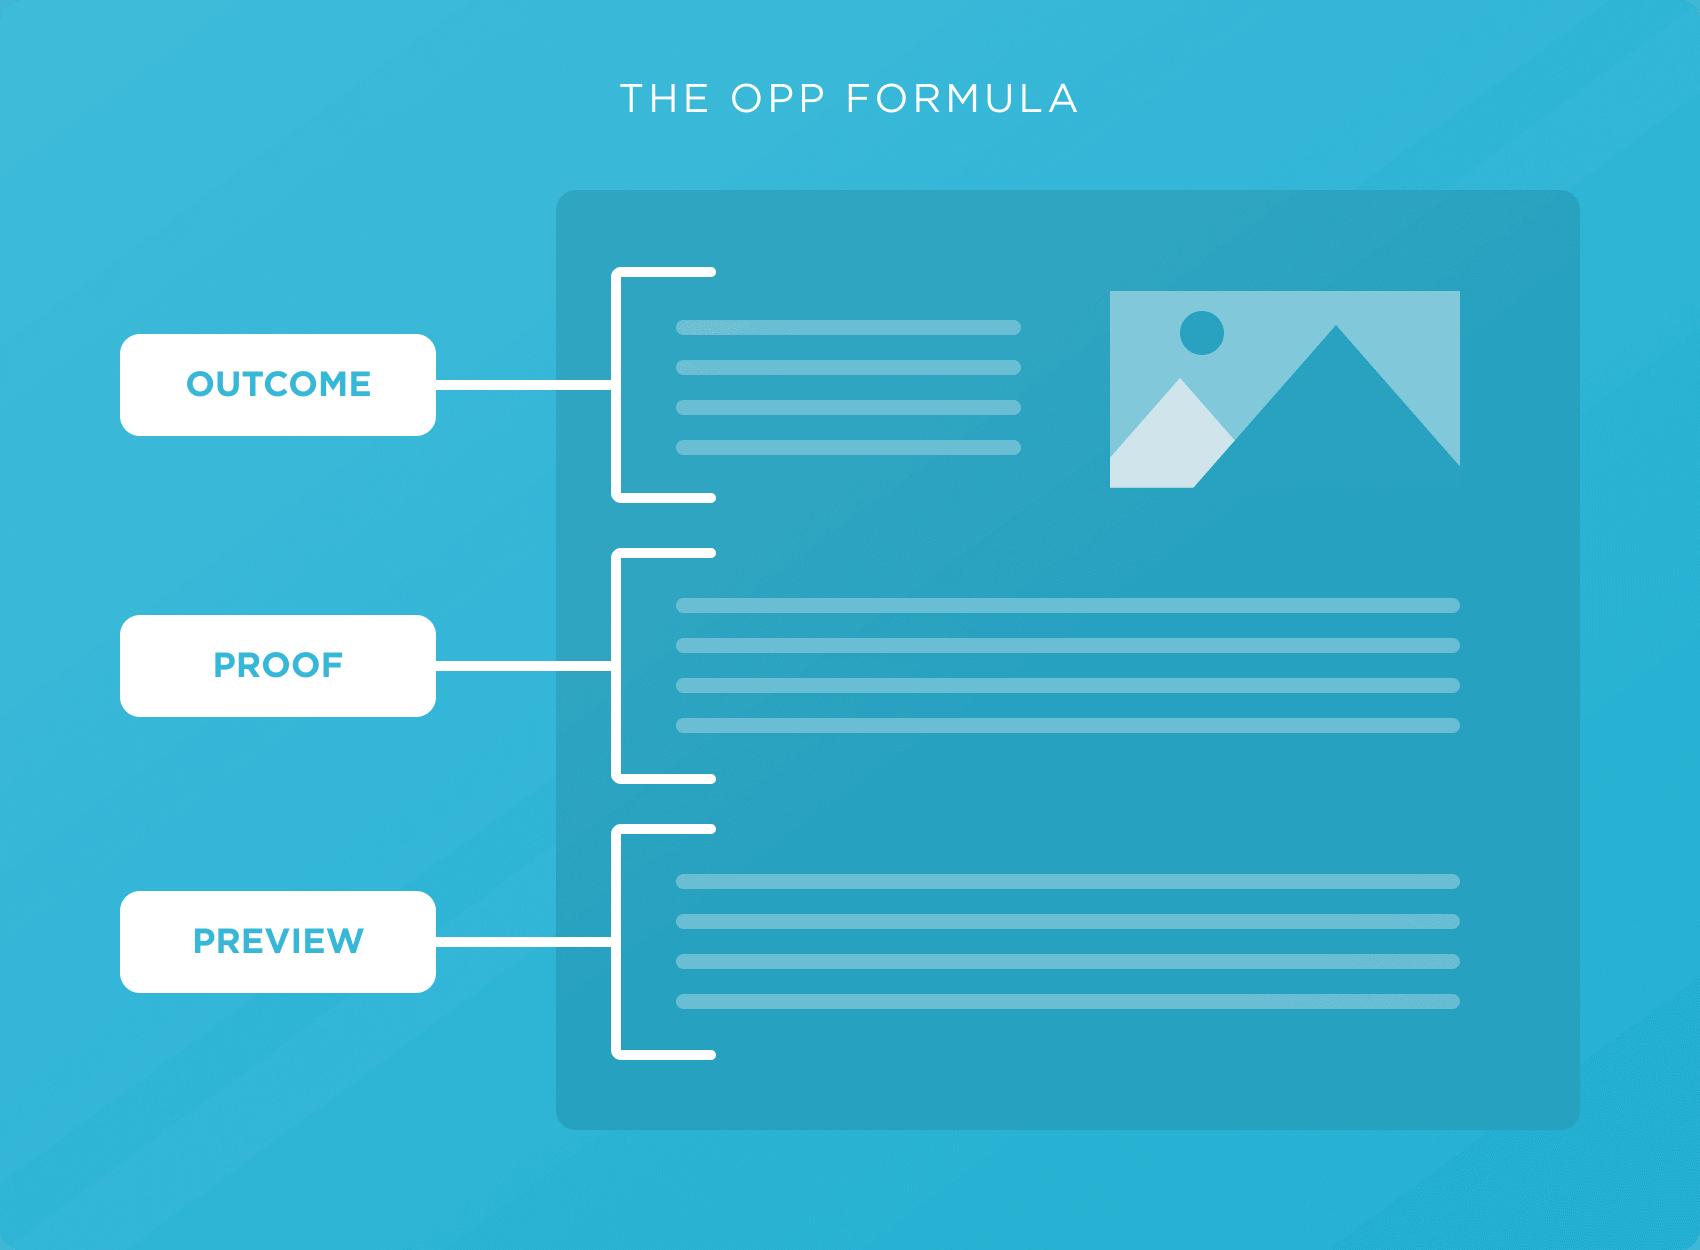 OPP formula overview